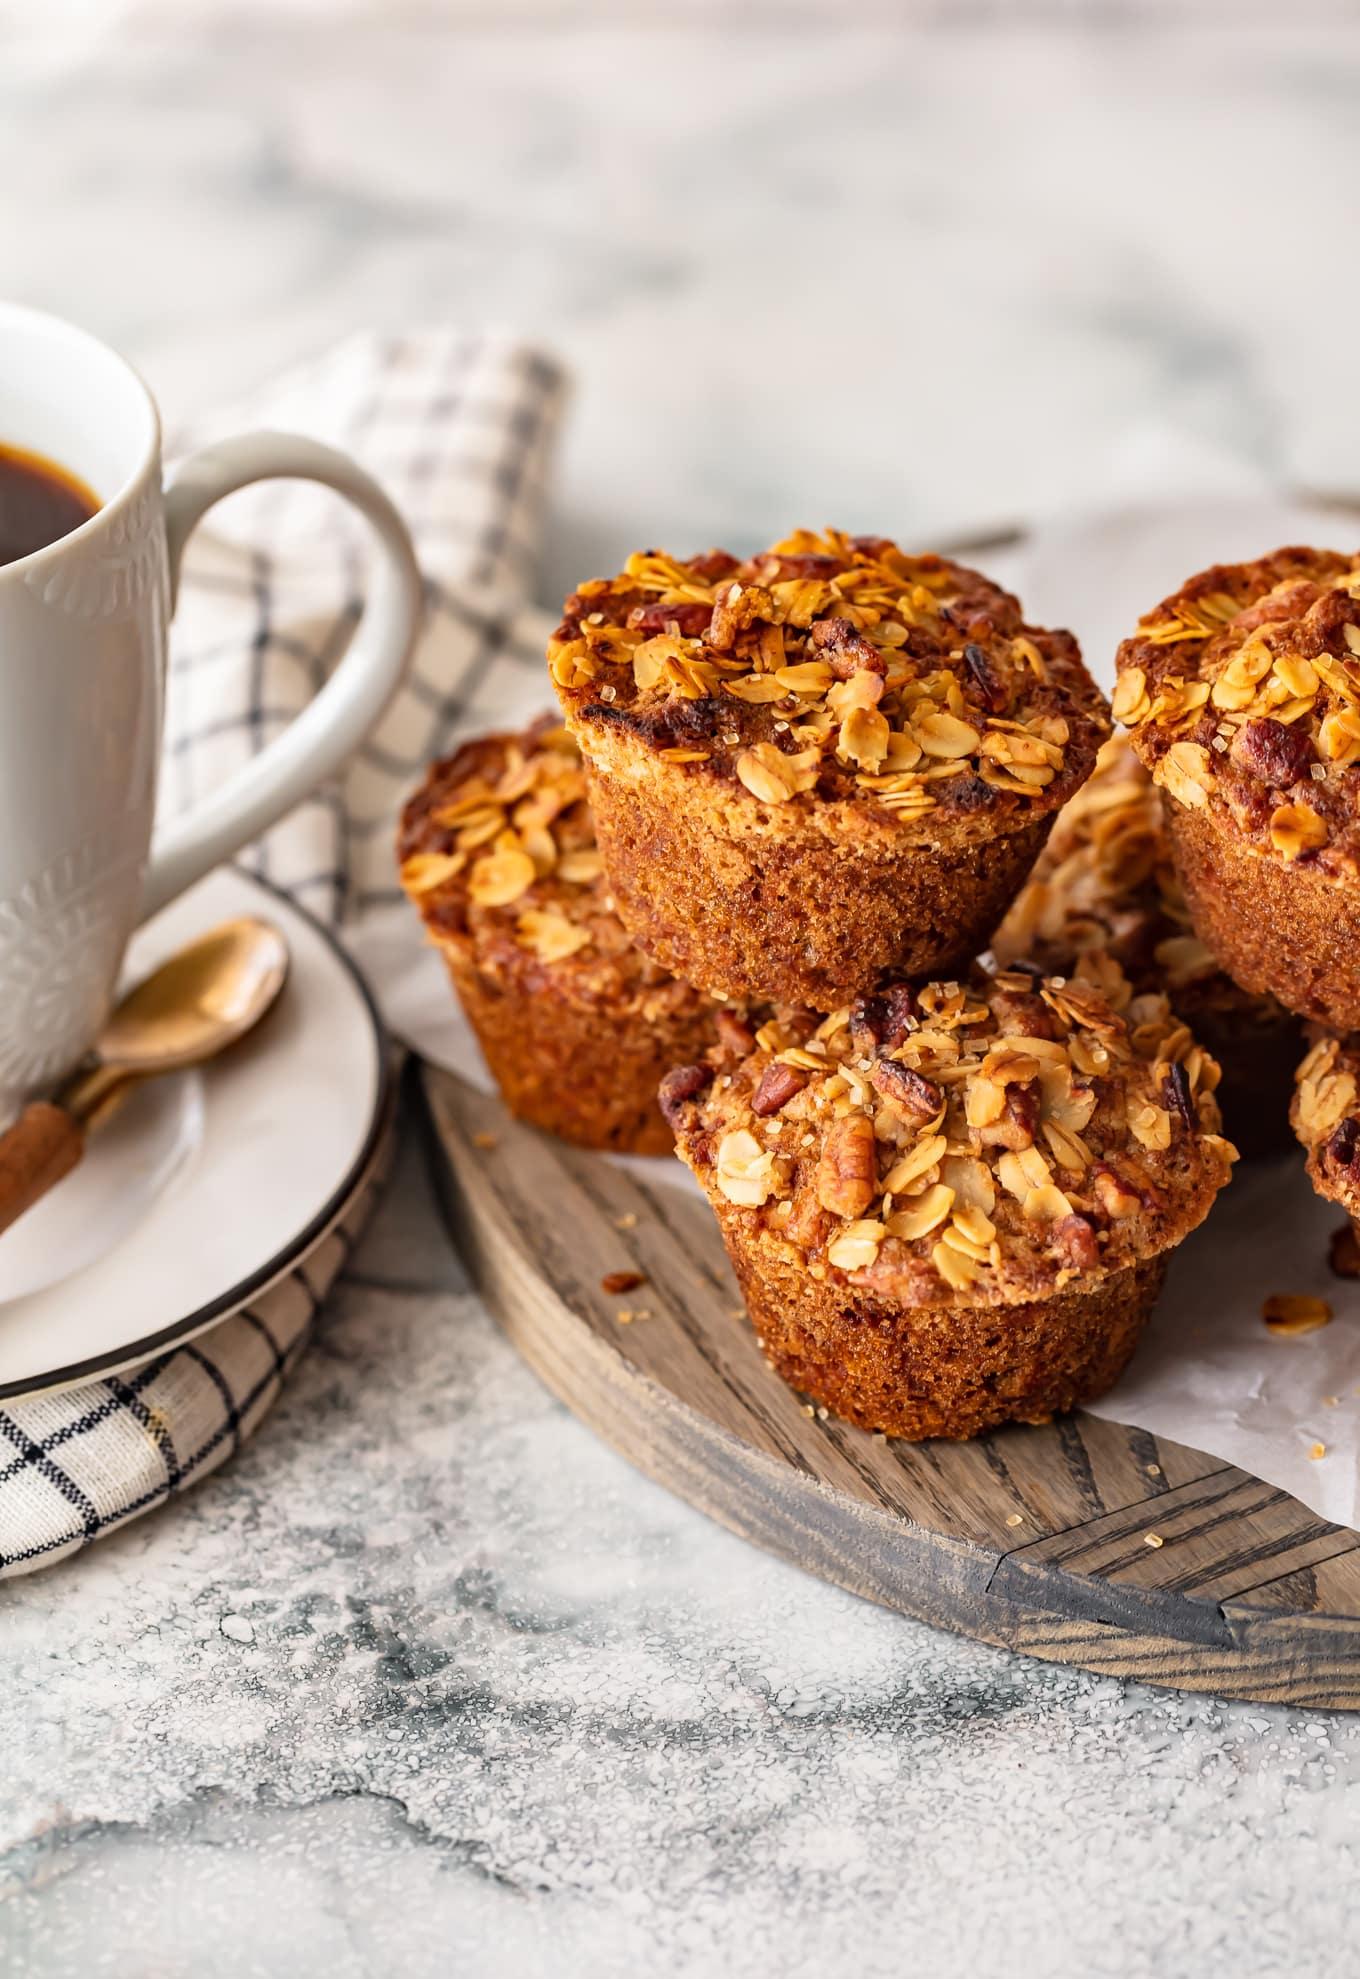 breakfast muffins on a wooden serving platter